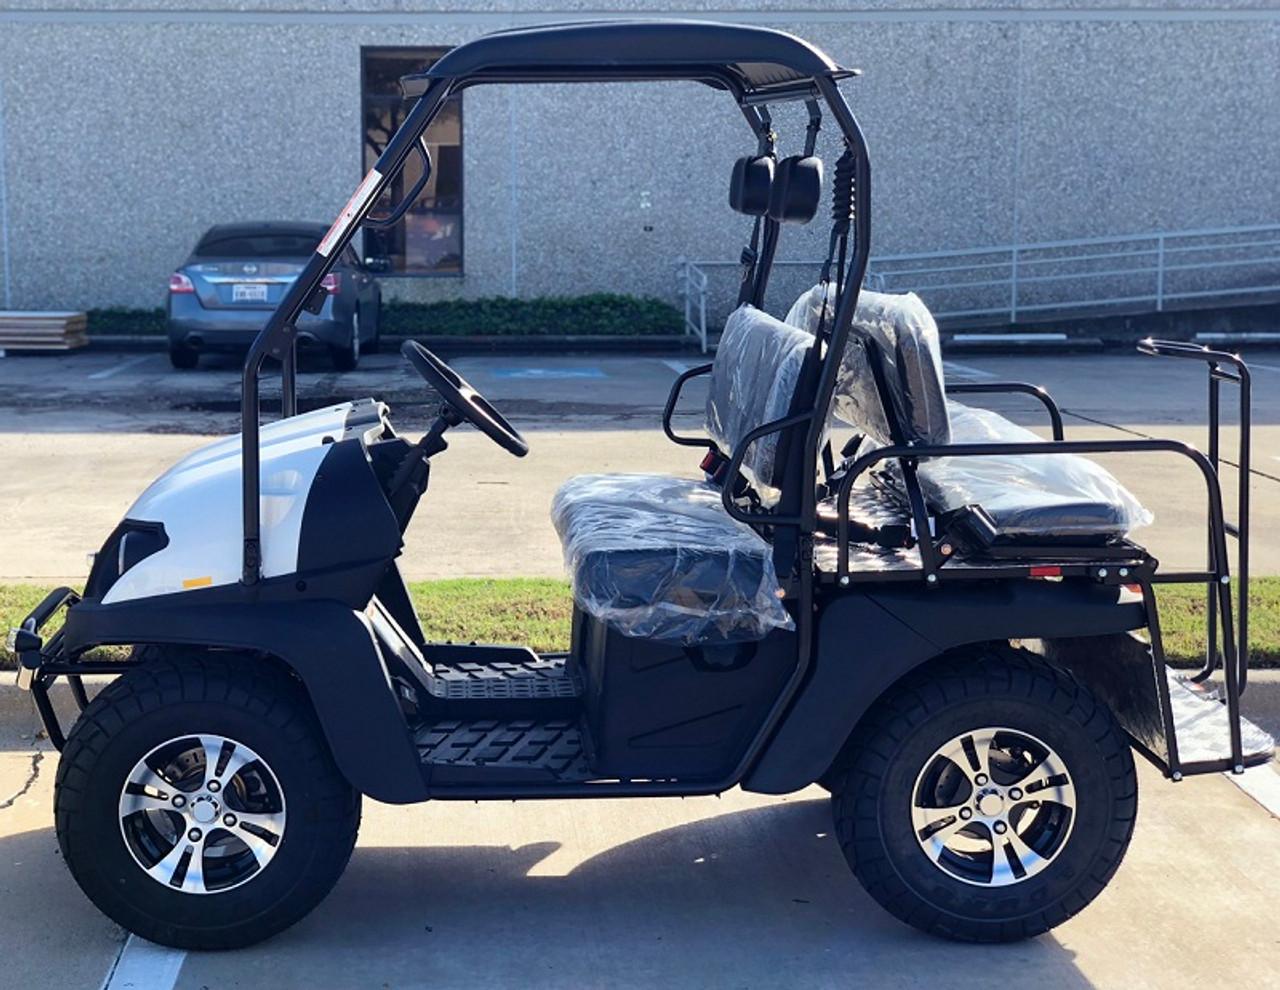 White- Fully Loaded Cazador OUTFITTER 200 Golf Cart 4 Seater Street Legal UTV